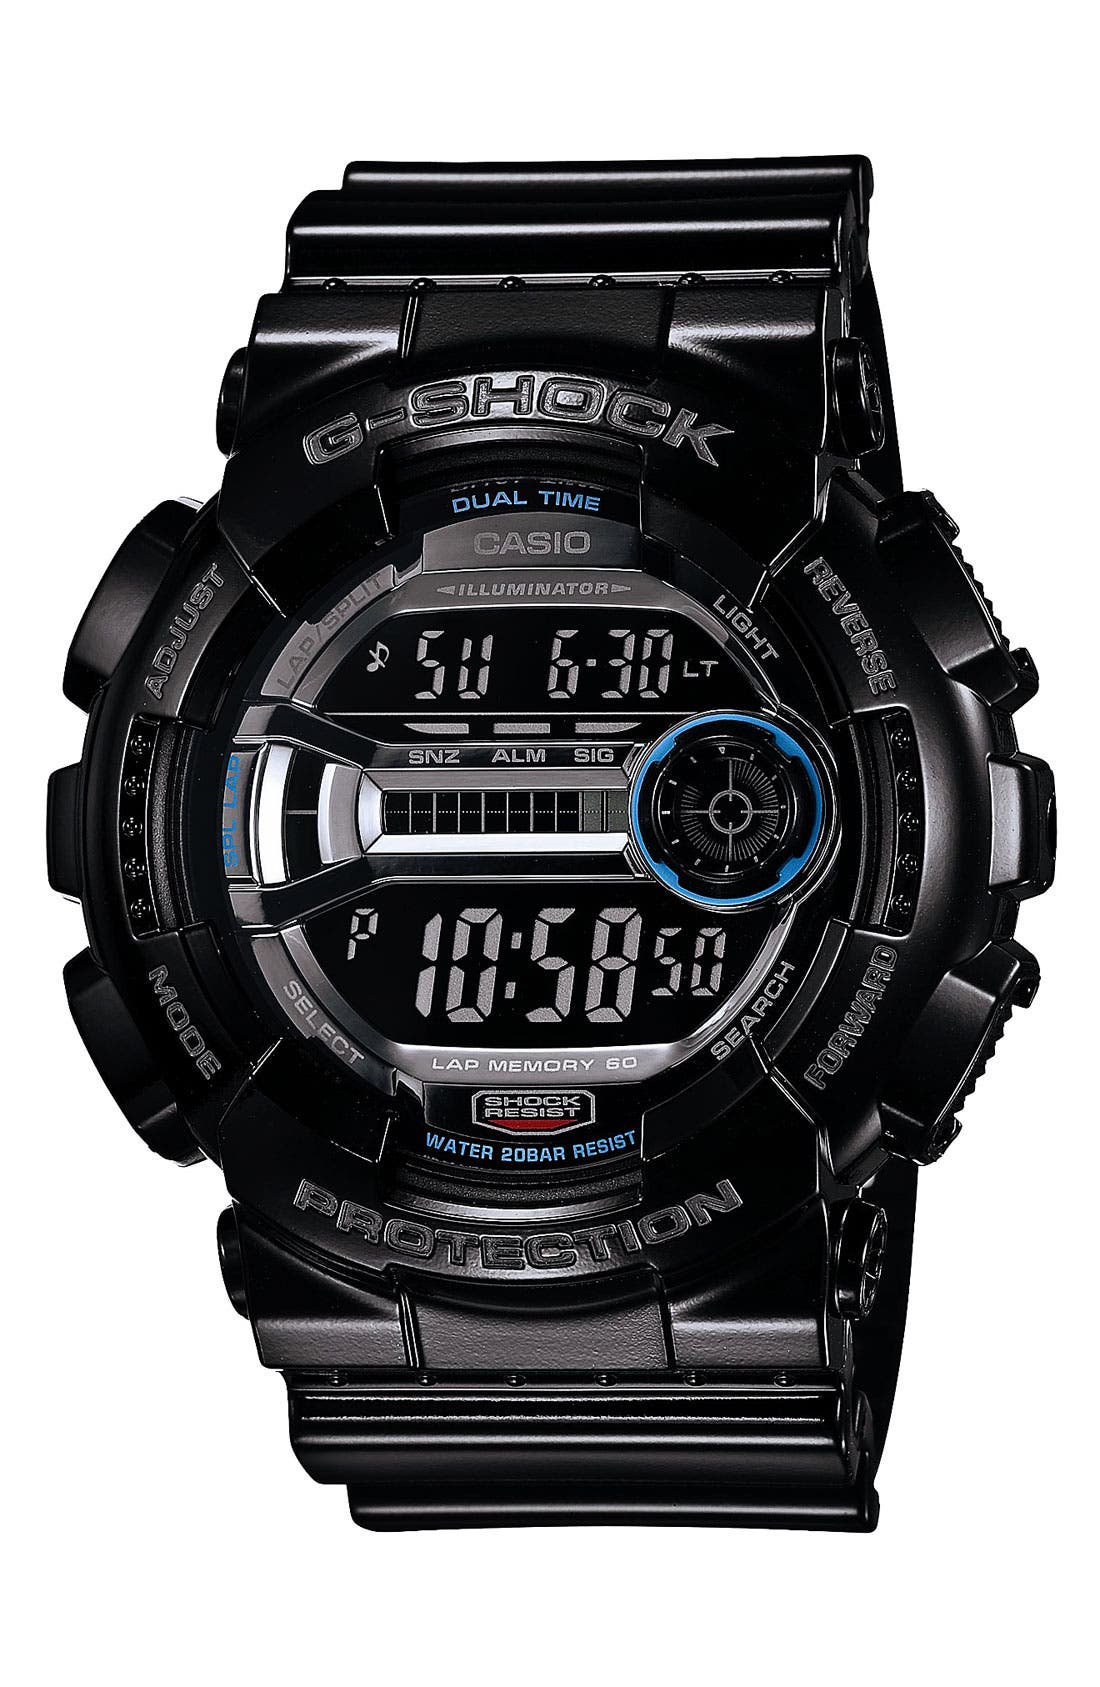 Alternate Image 1 Selected - G-Shock 'X-Large' Digital Watch, 55mm x 51mm